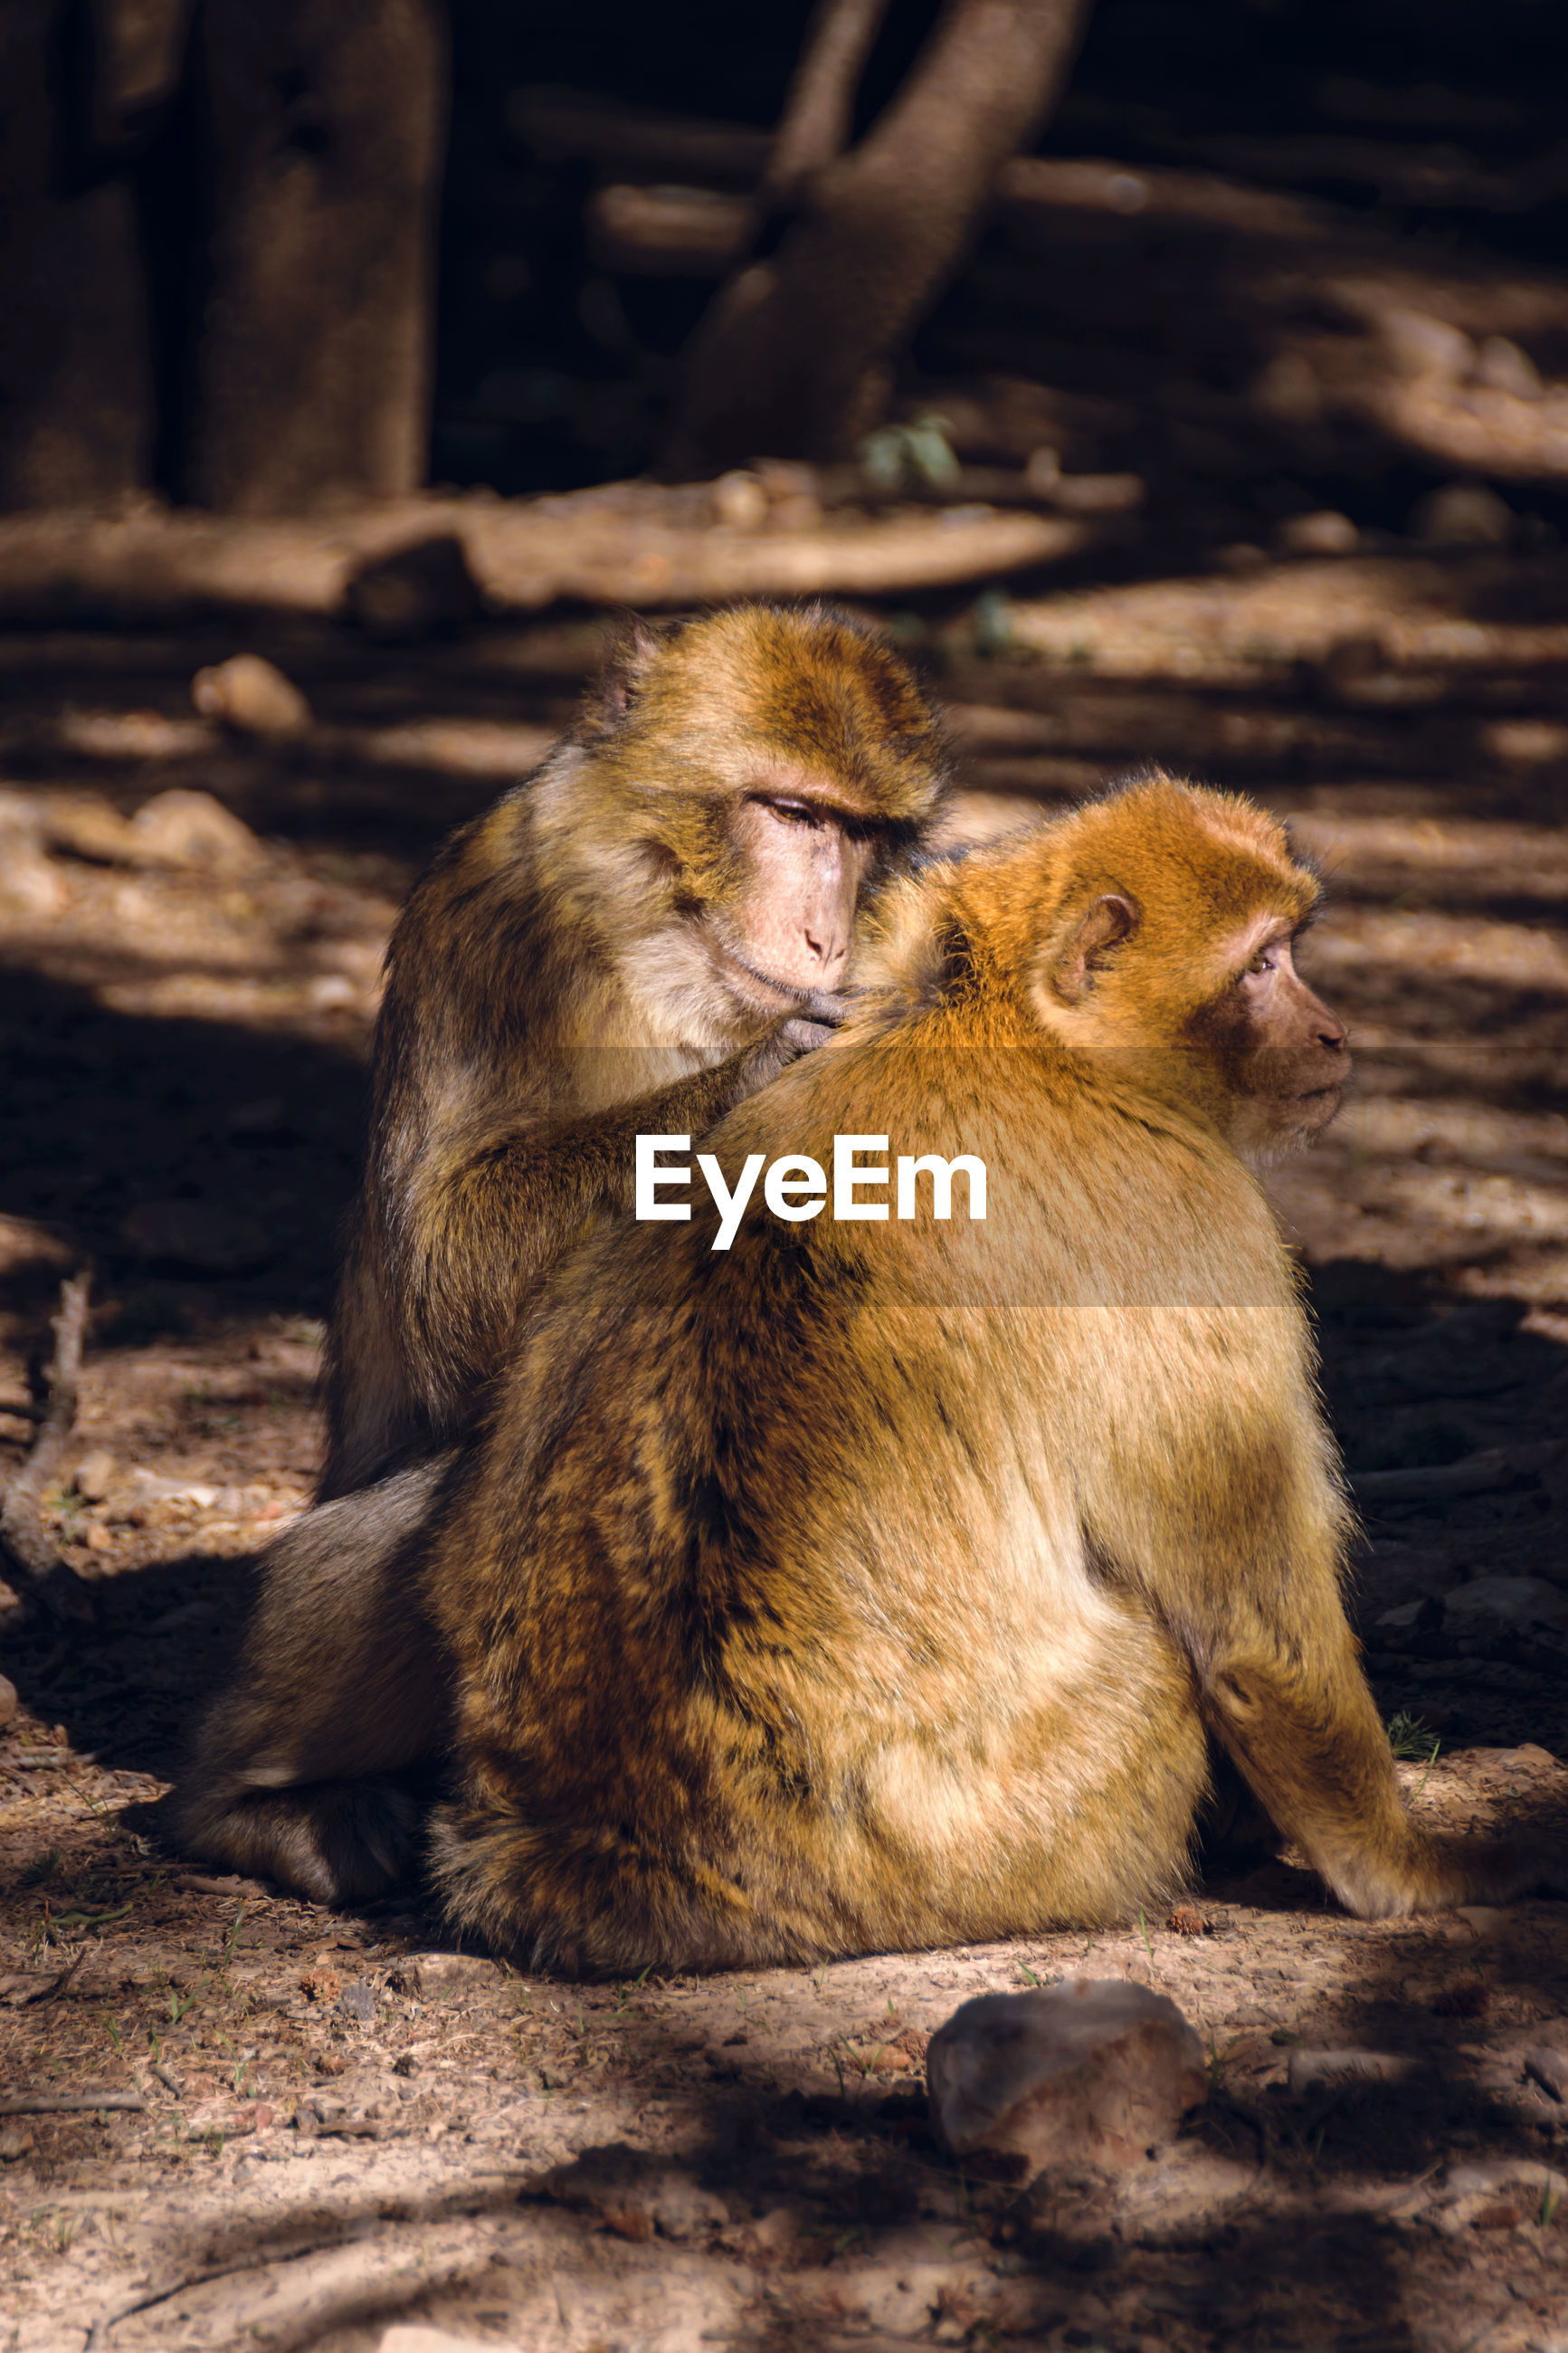 Close-up of monkeys sitting at zoo